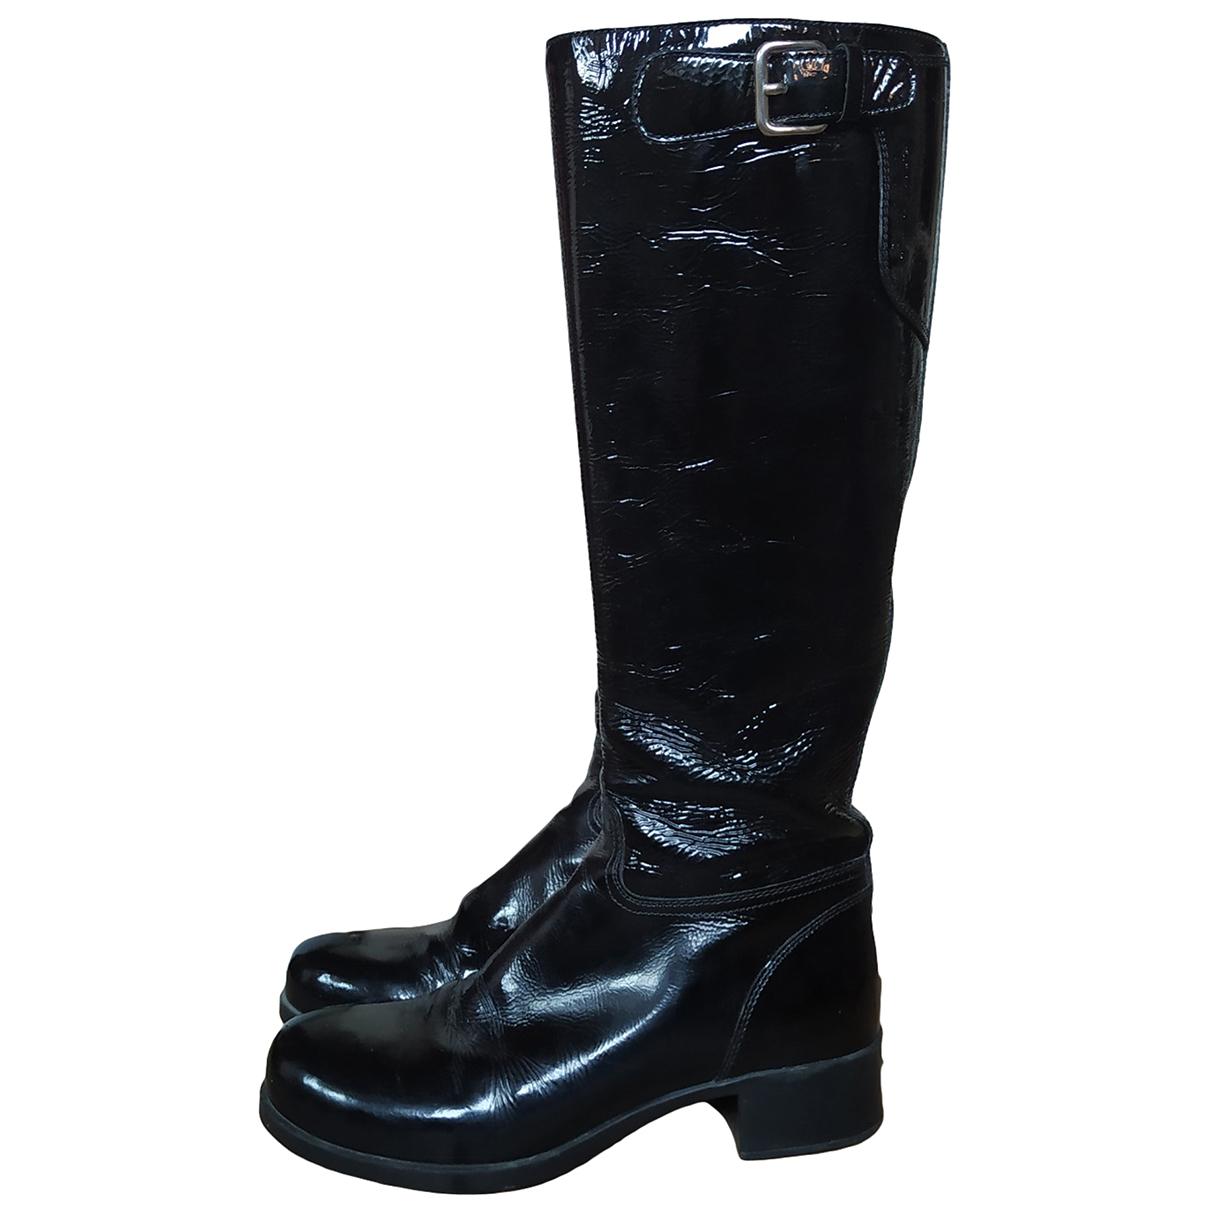 Prada \N Black Patent leather Boots for Women 36 EU